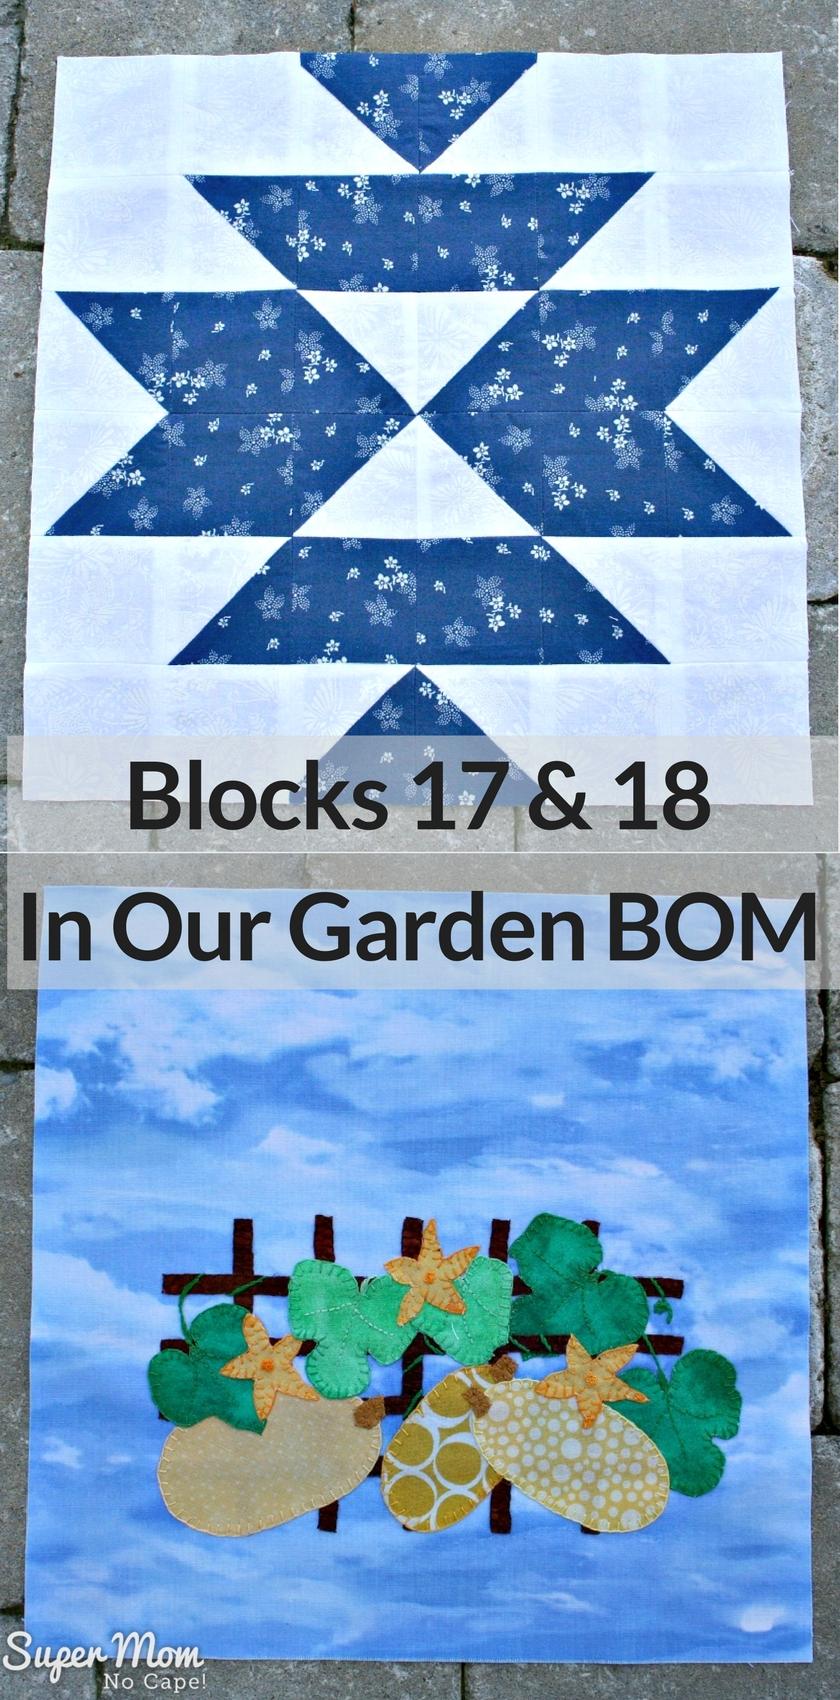 Blocks 17 & 18 - In Our Garden BOM